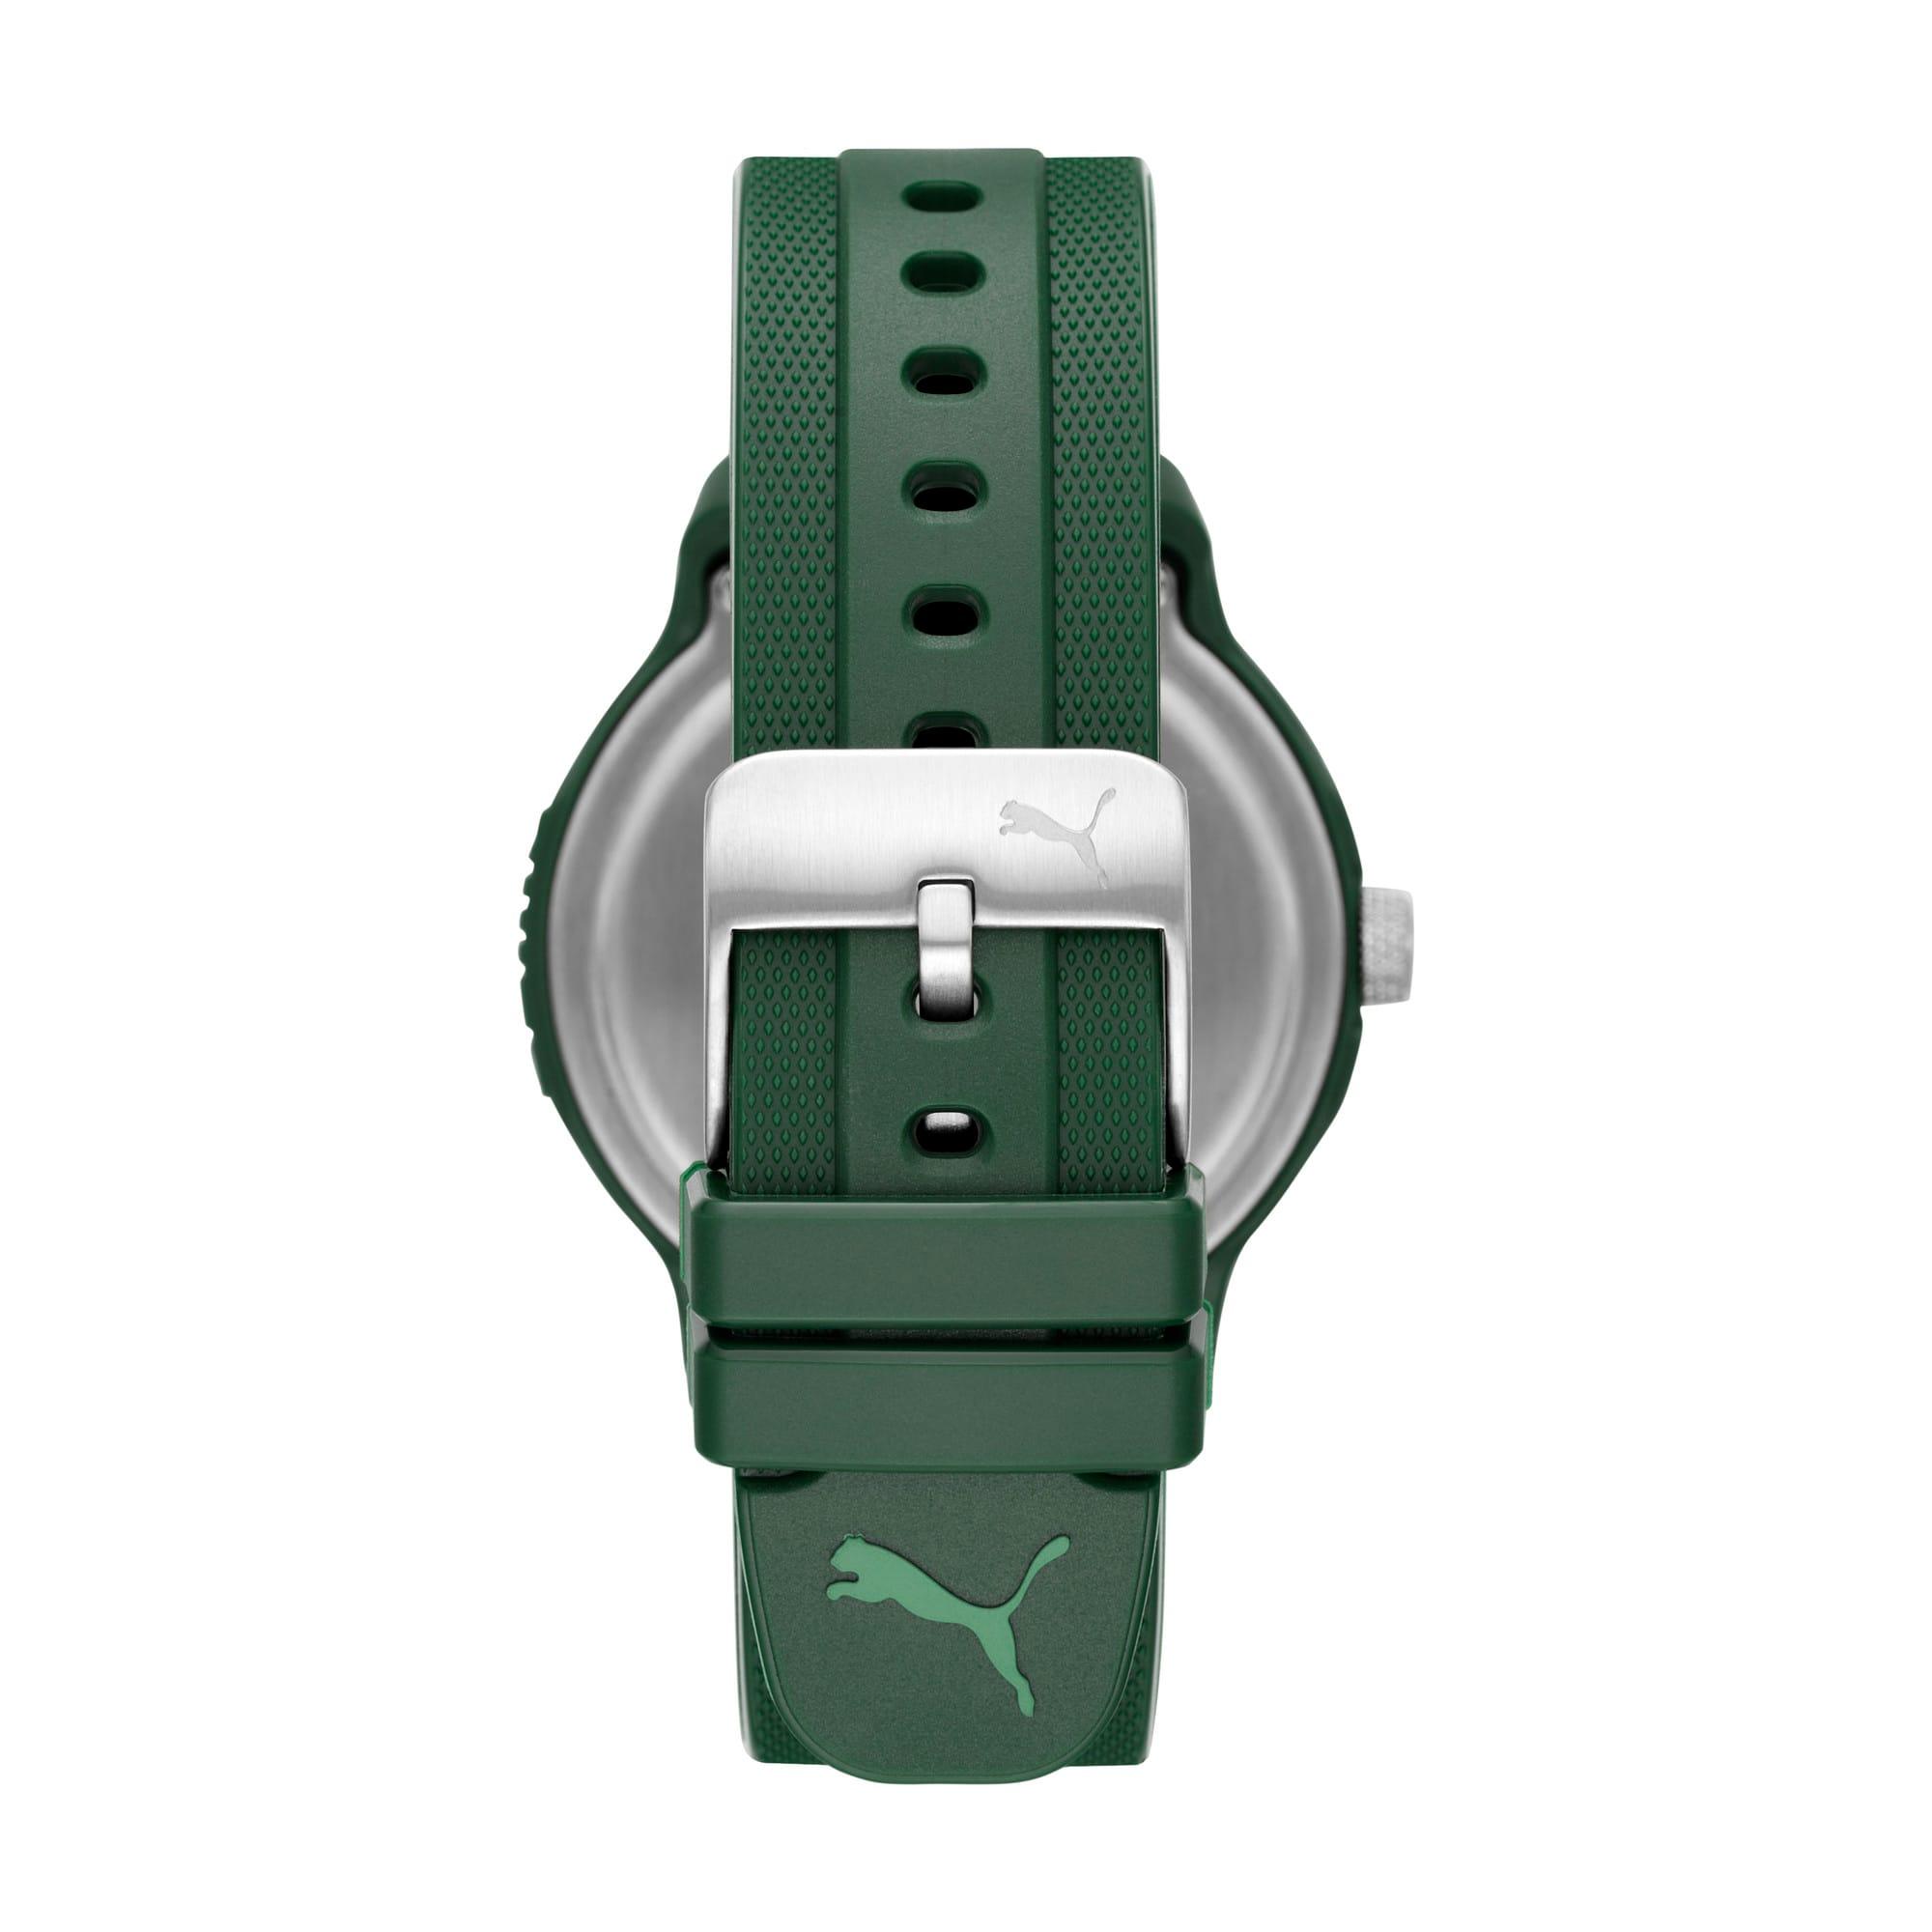 Thumbnail 2 of Reset v2 Watch, Green/Green, medium